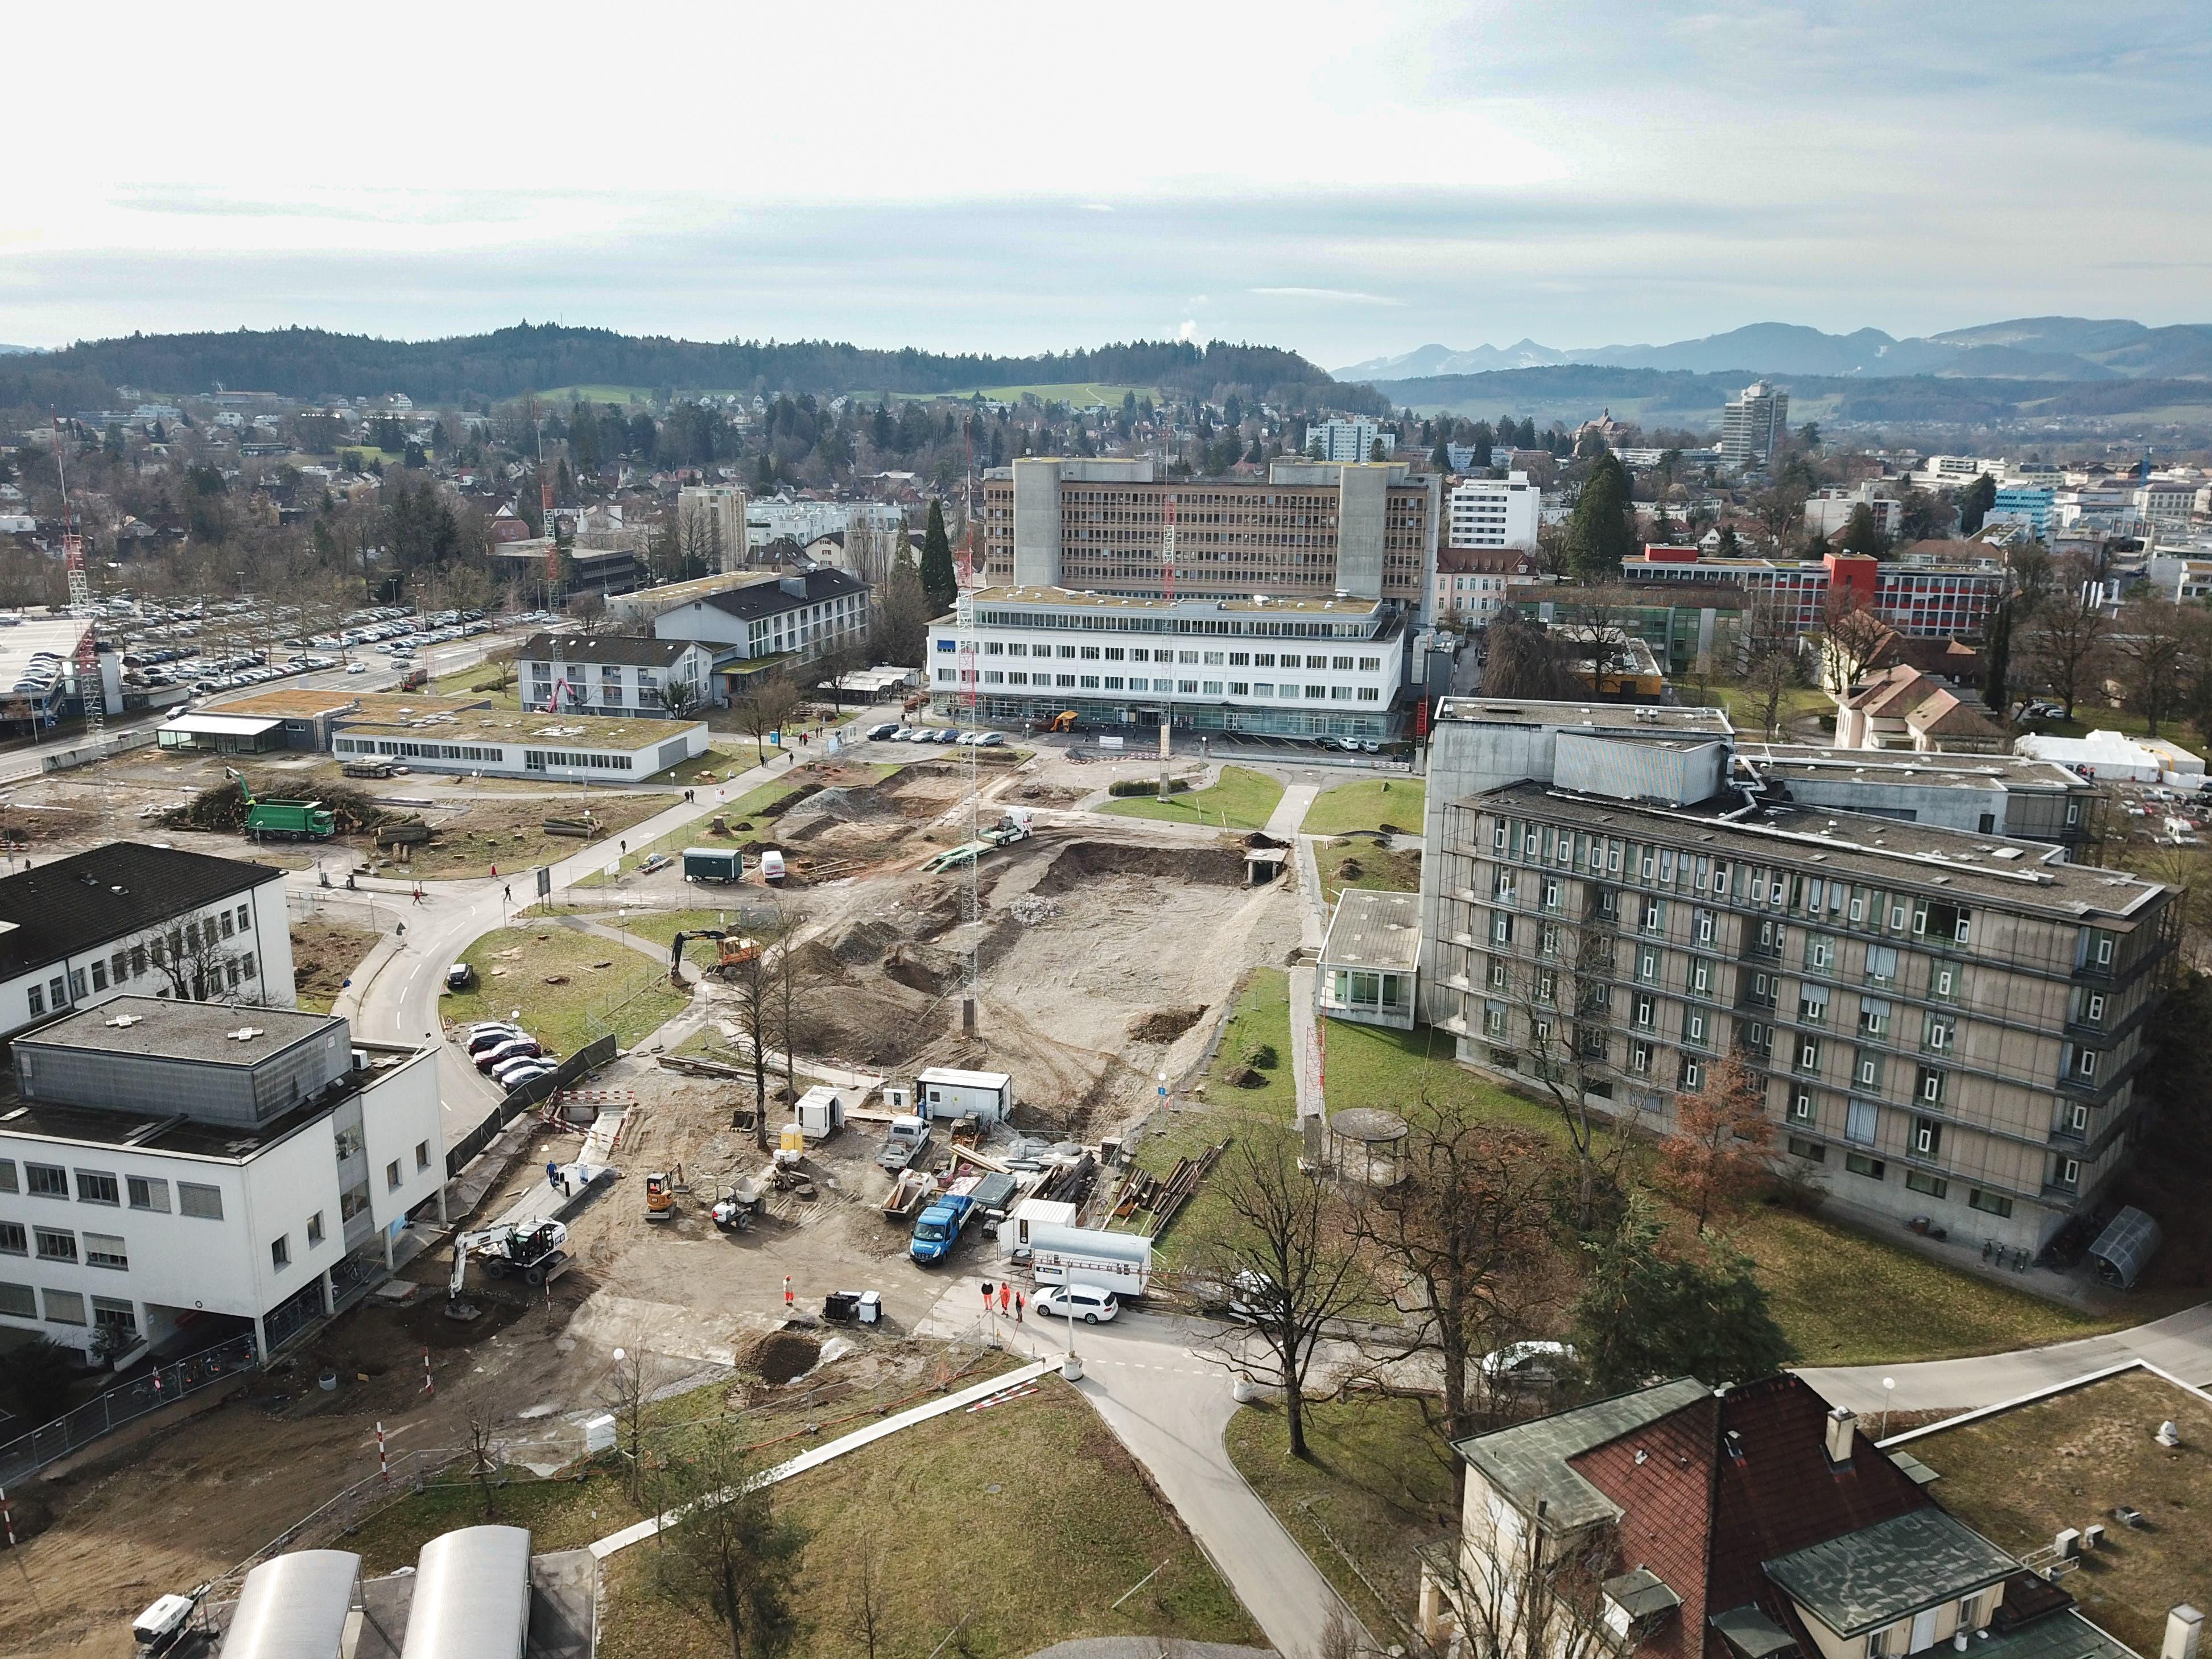 Ersatzneubau Kantonsspital Aarau, Tellstrasse: 619 Millionen Franken.